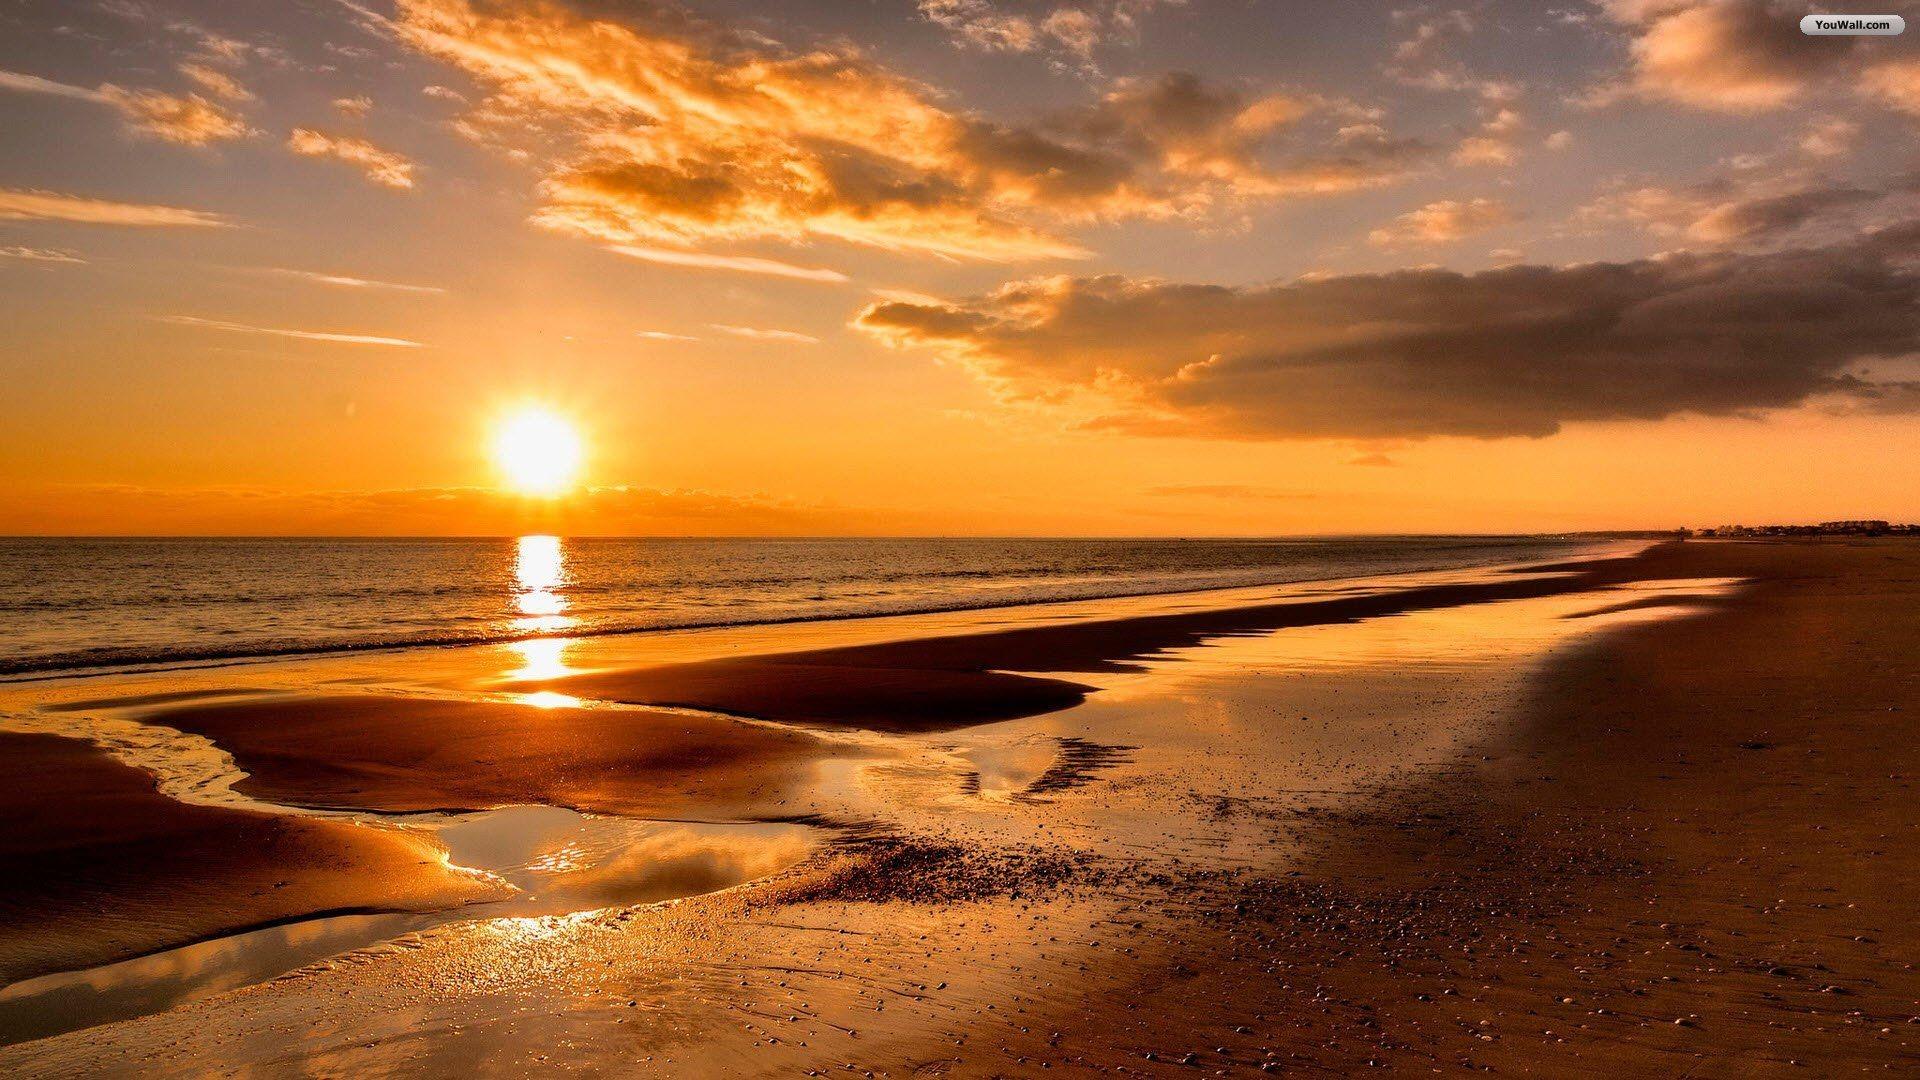 Beach Sunset Windows Background